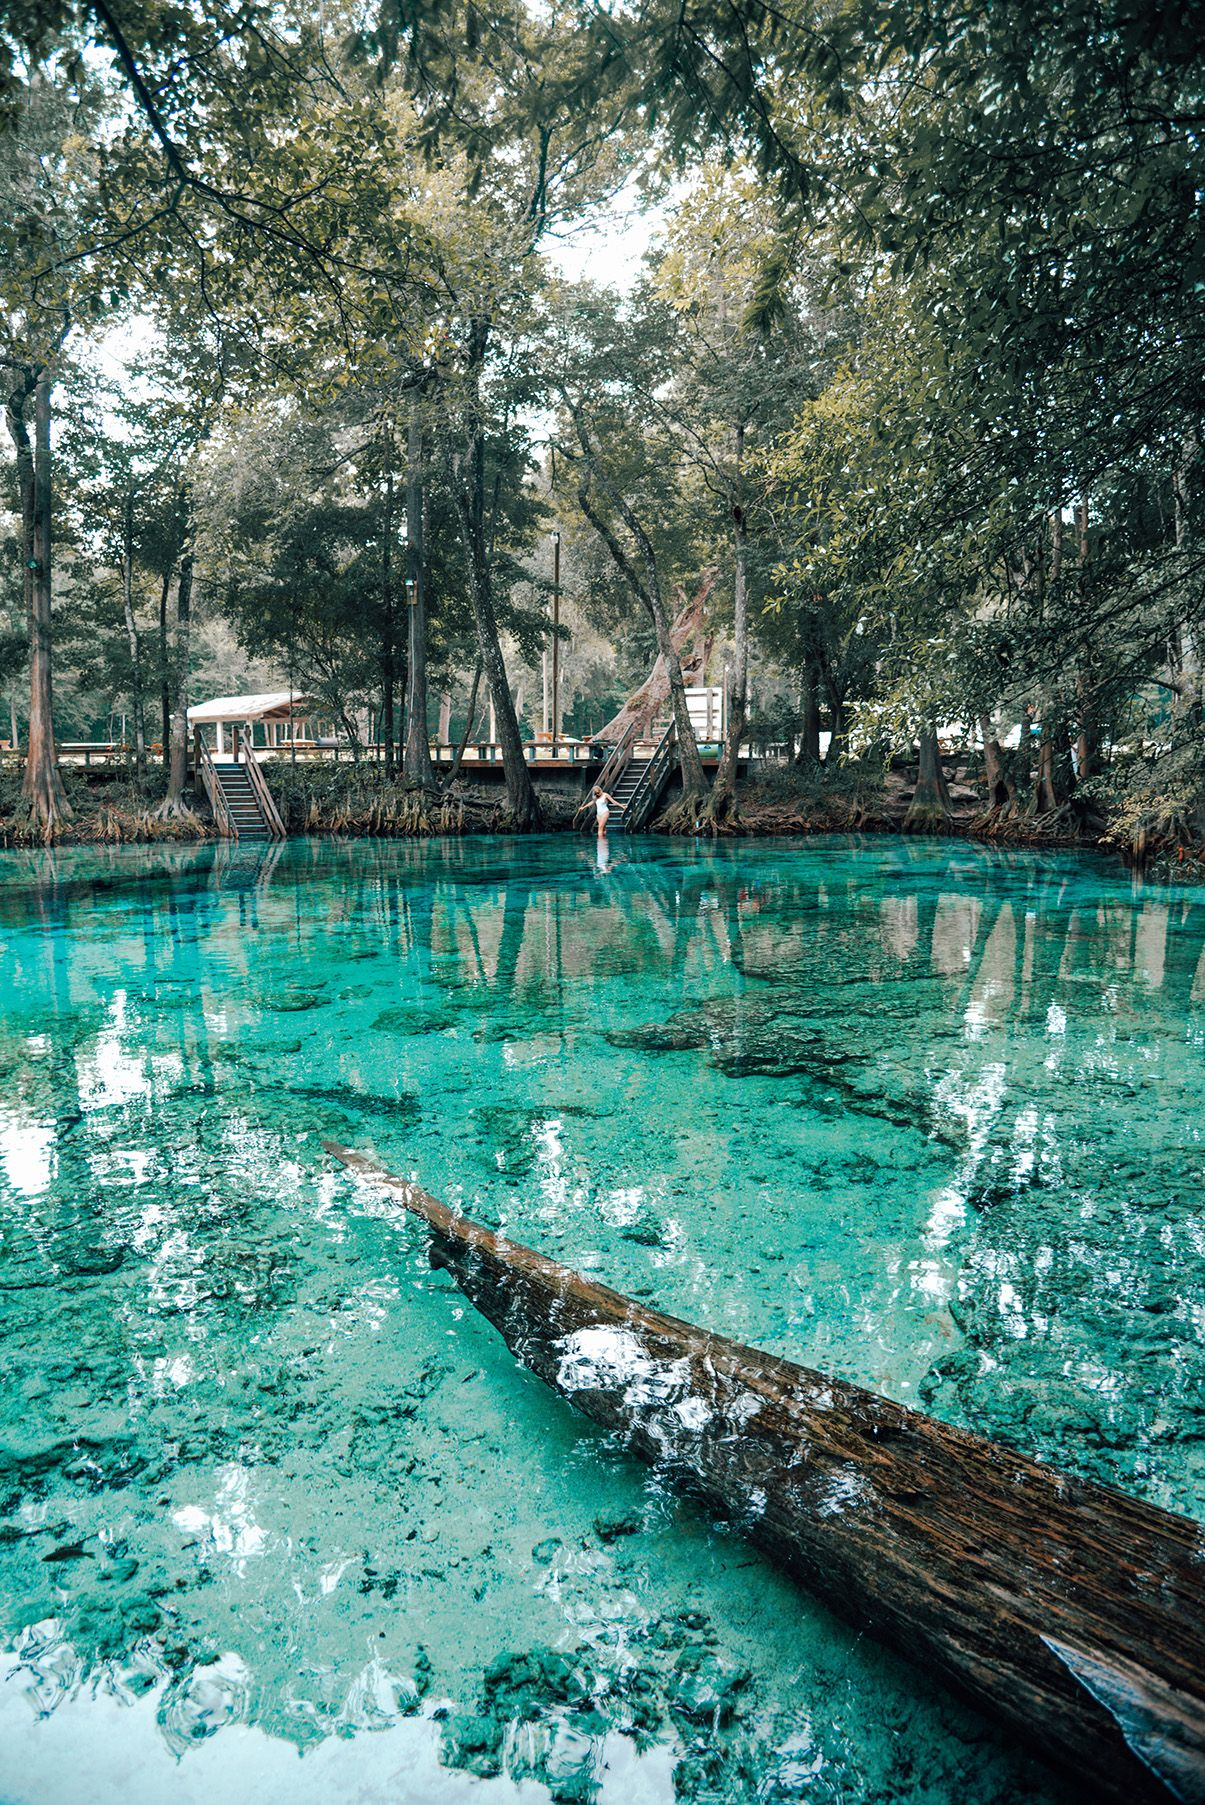 The perfect family trip to Ginnie Springs | Florida | USA